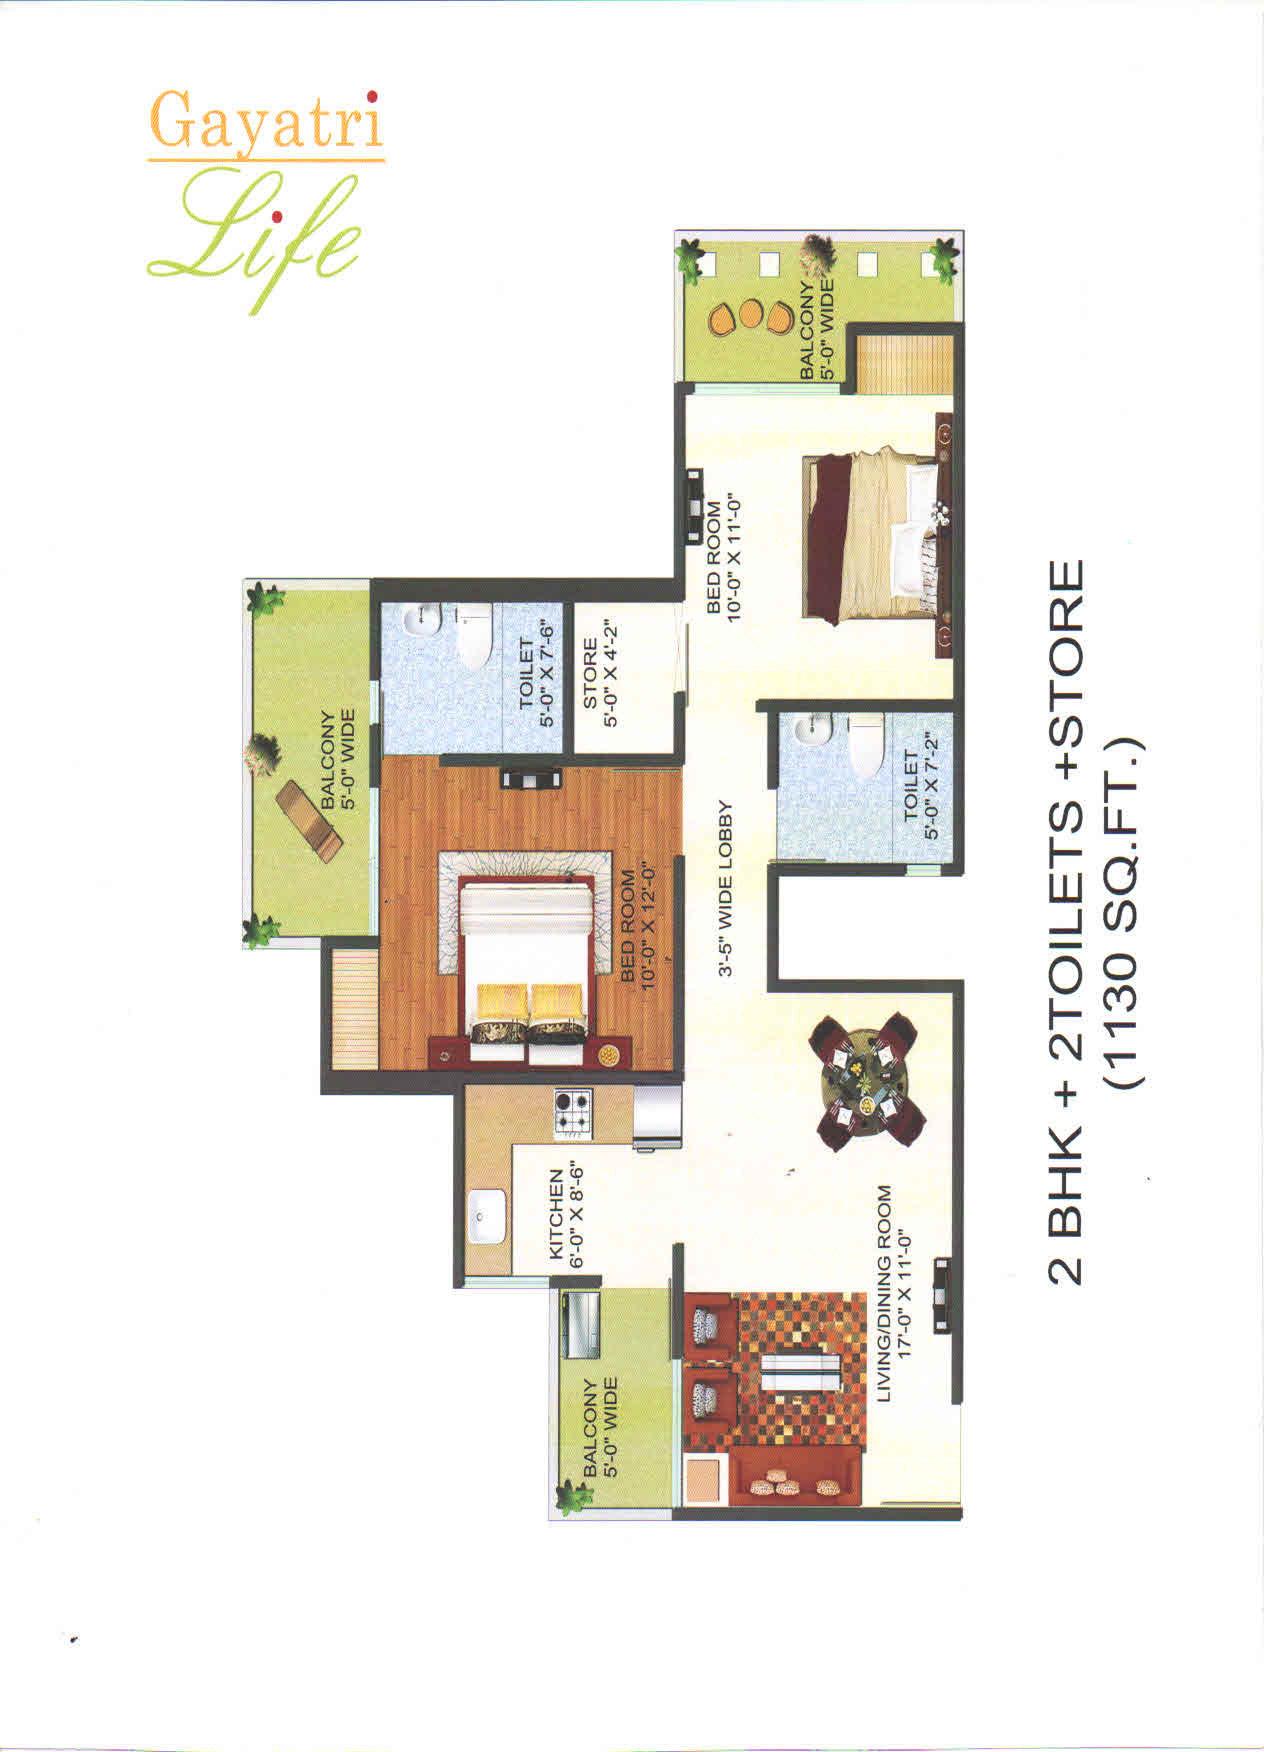 gayatri life floor plan4